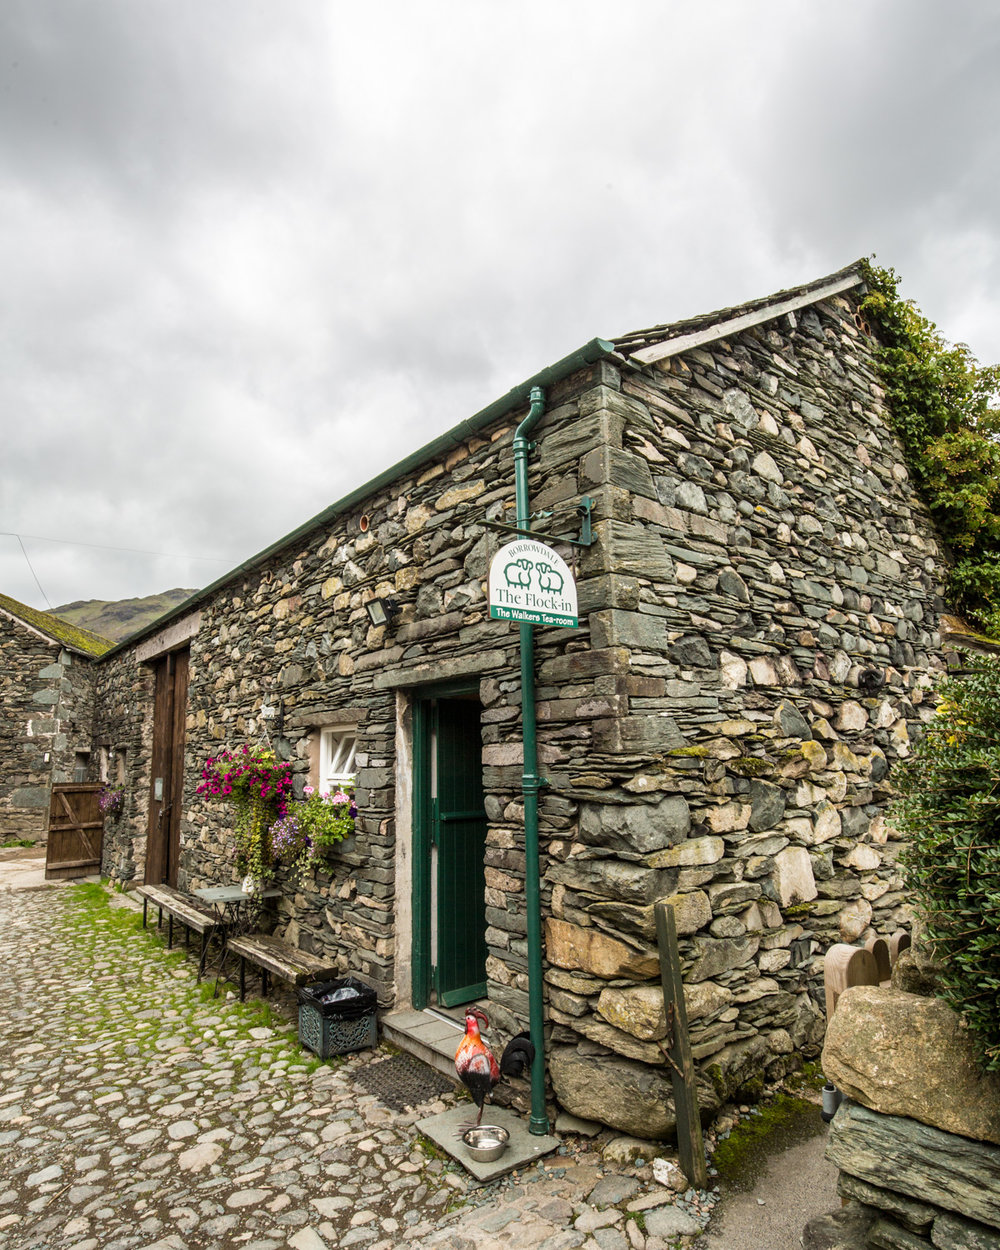 Traditional buildings in Borrowdale